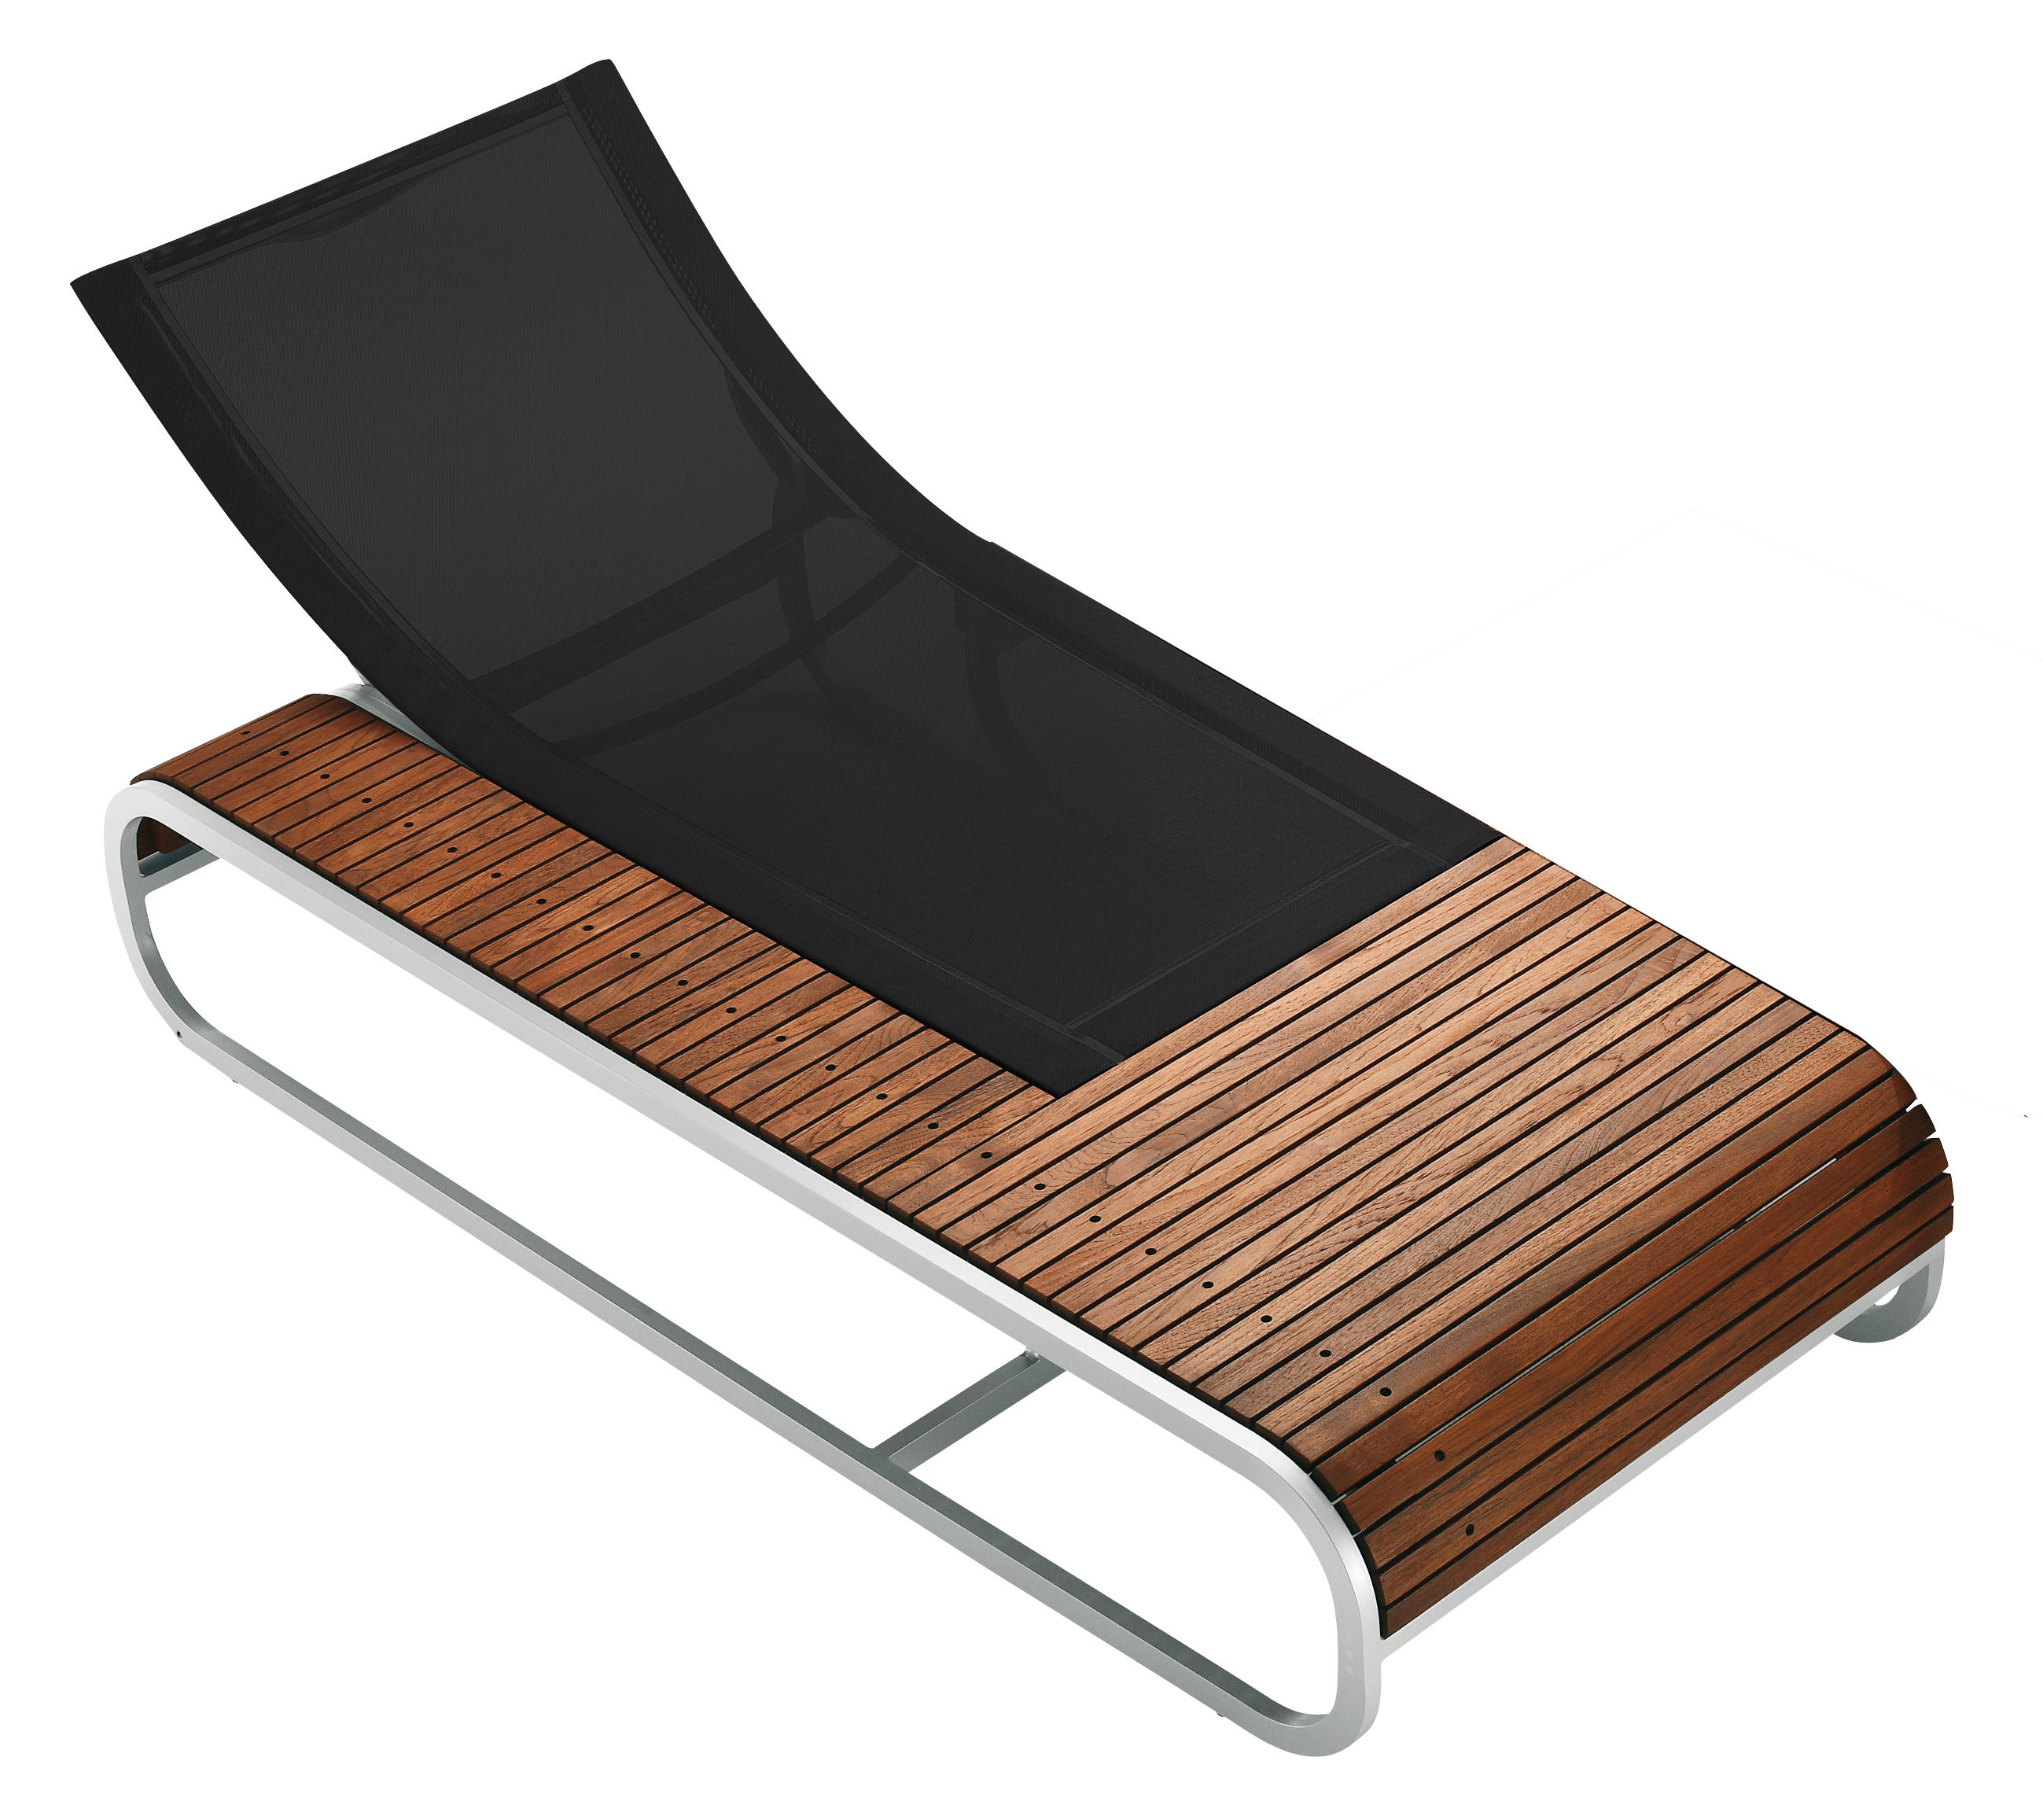 Tandem reclining chair teak version teck black fabric - Chaise longue teck pas cher ...